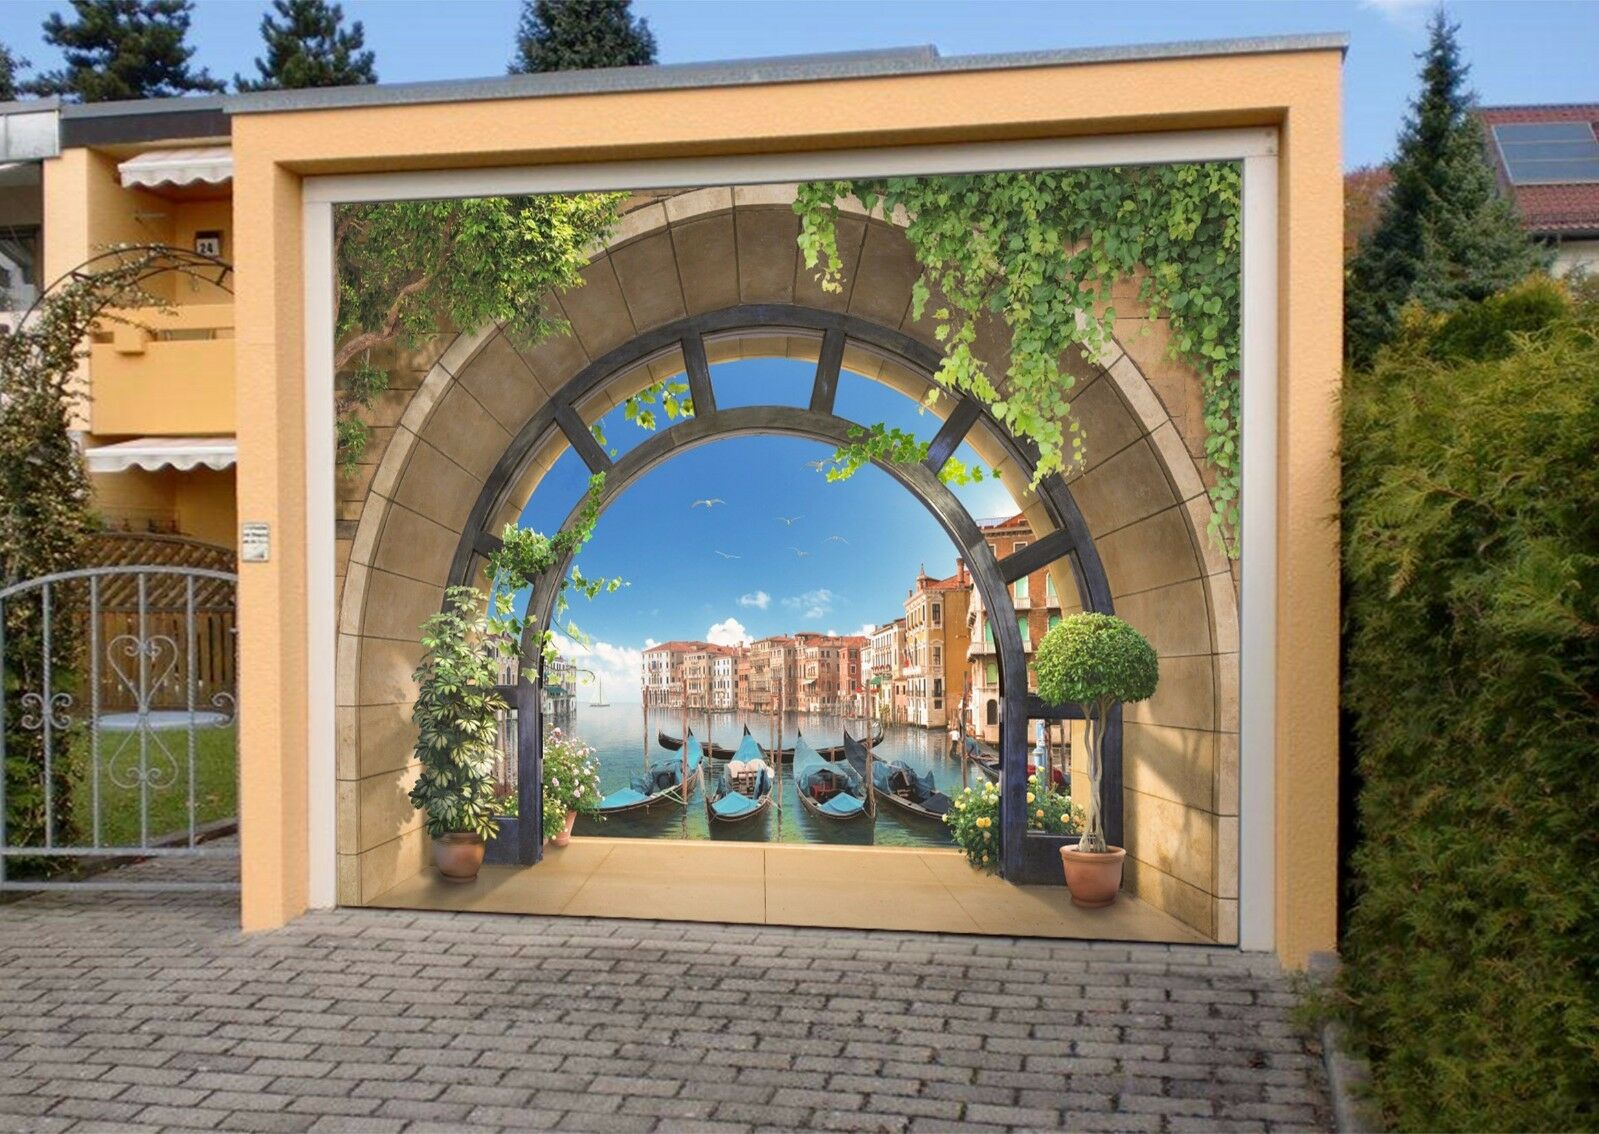 3D Balcony Ship 9 Garage Door Murals Wall Print Decal Wall AJ WALLPAPER UK Carly